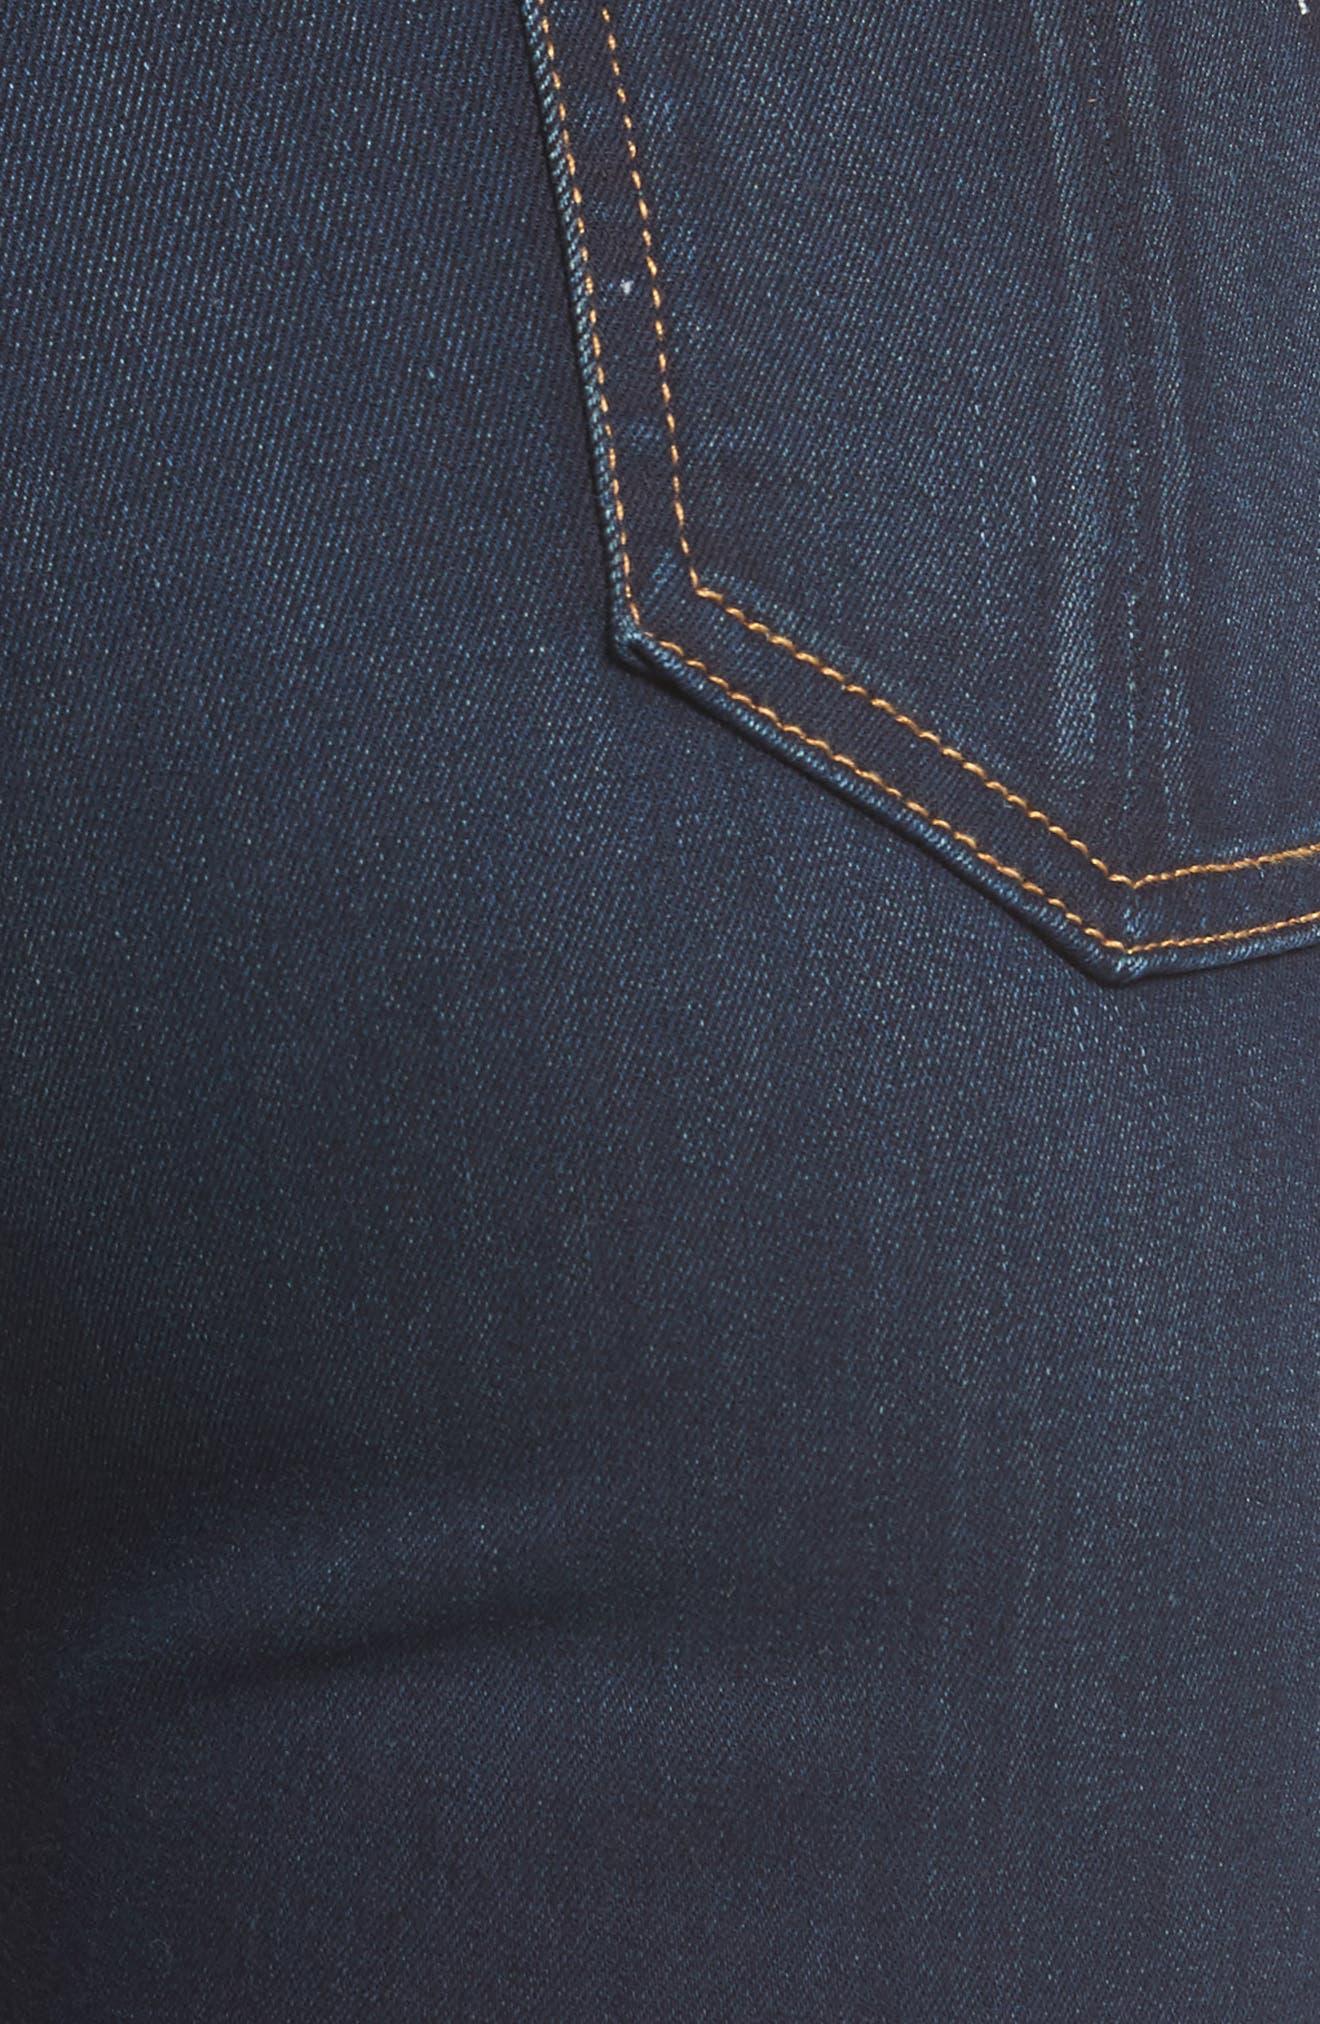 Alternate Image 5  - rag & bone DENIM High Waist Skinny Jeans (Bedford)